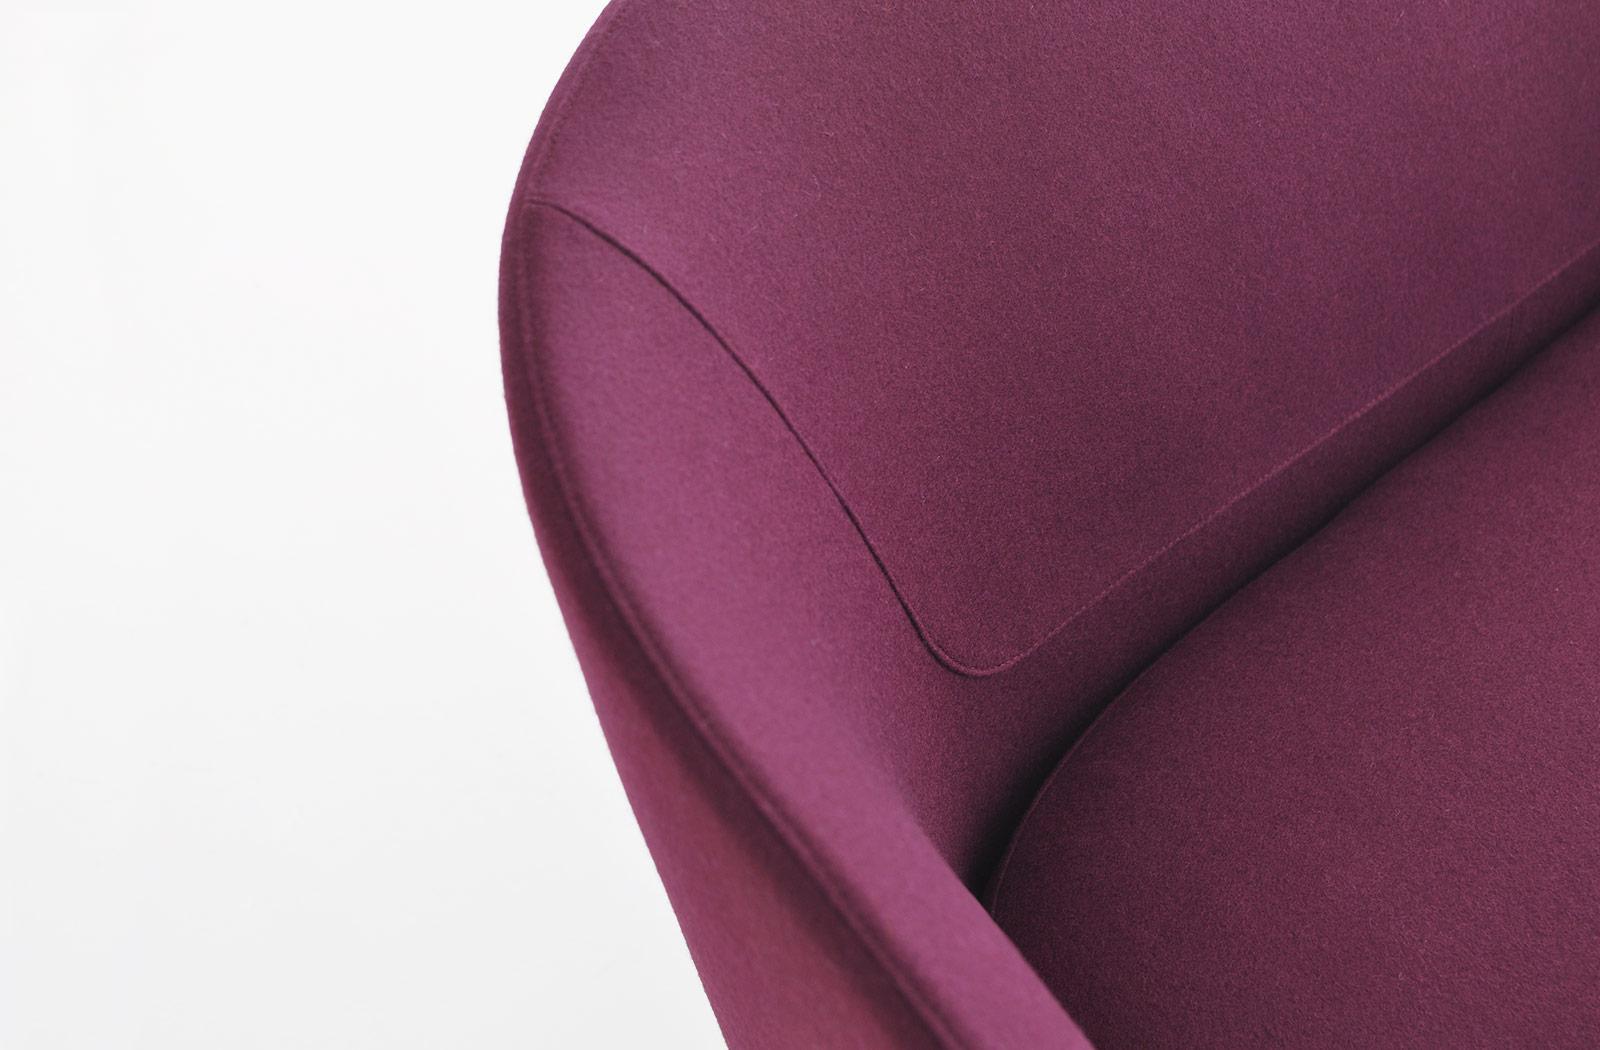 U Sofa by Bensen